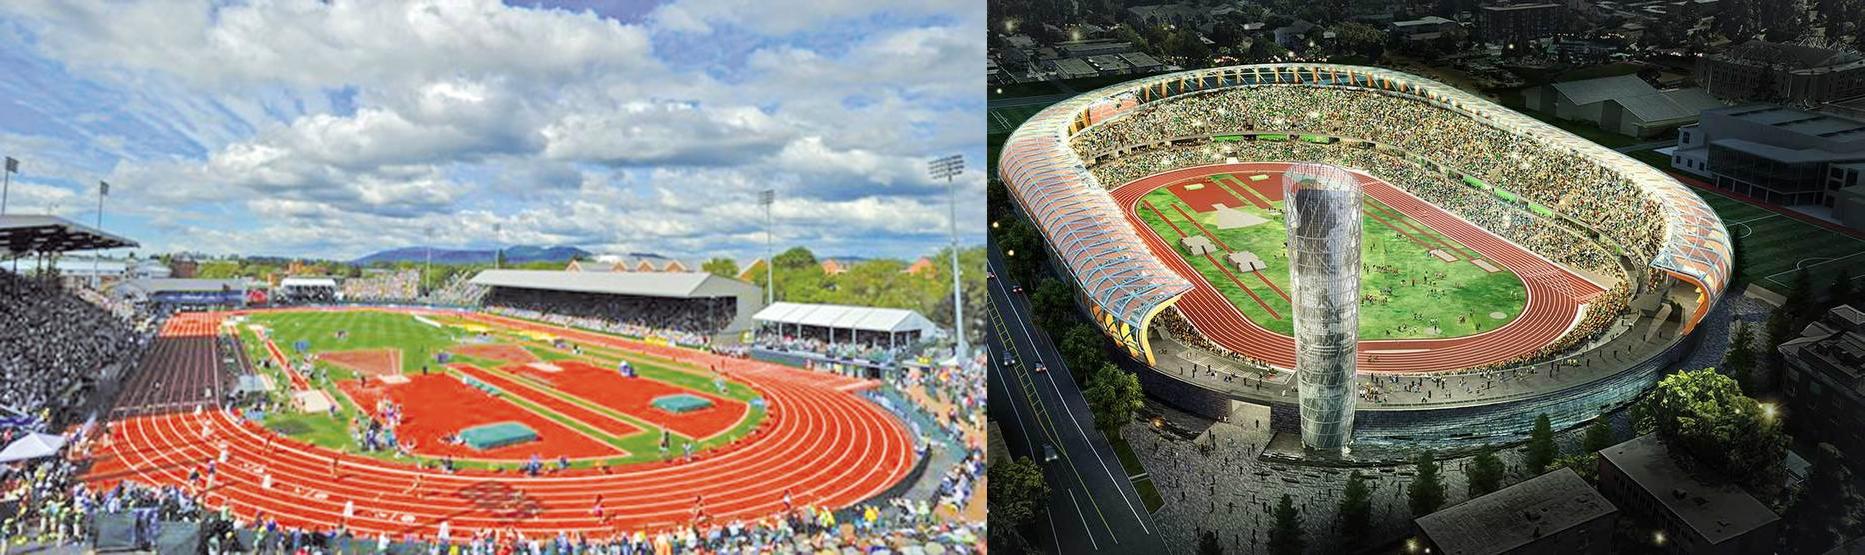 Atletski stadion u Oregonu (SAD), 2019 - 2021